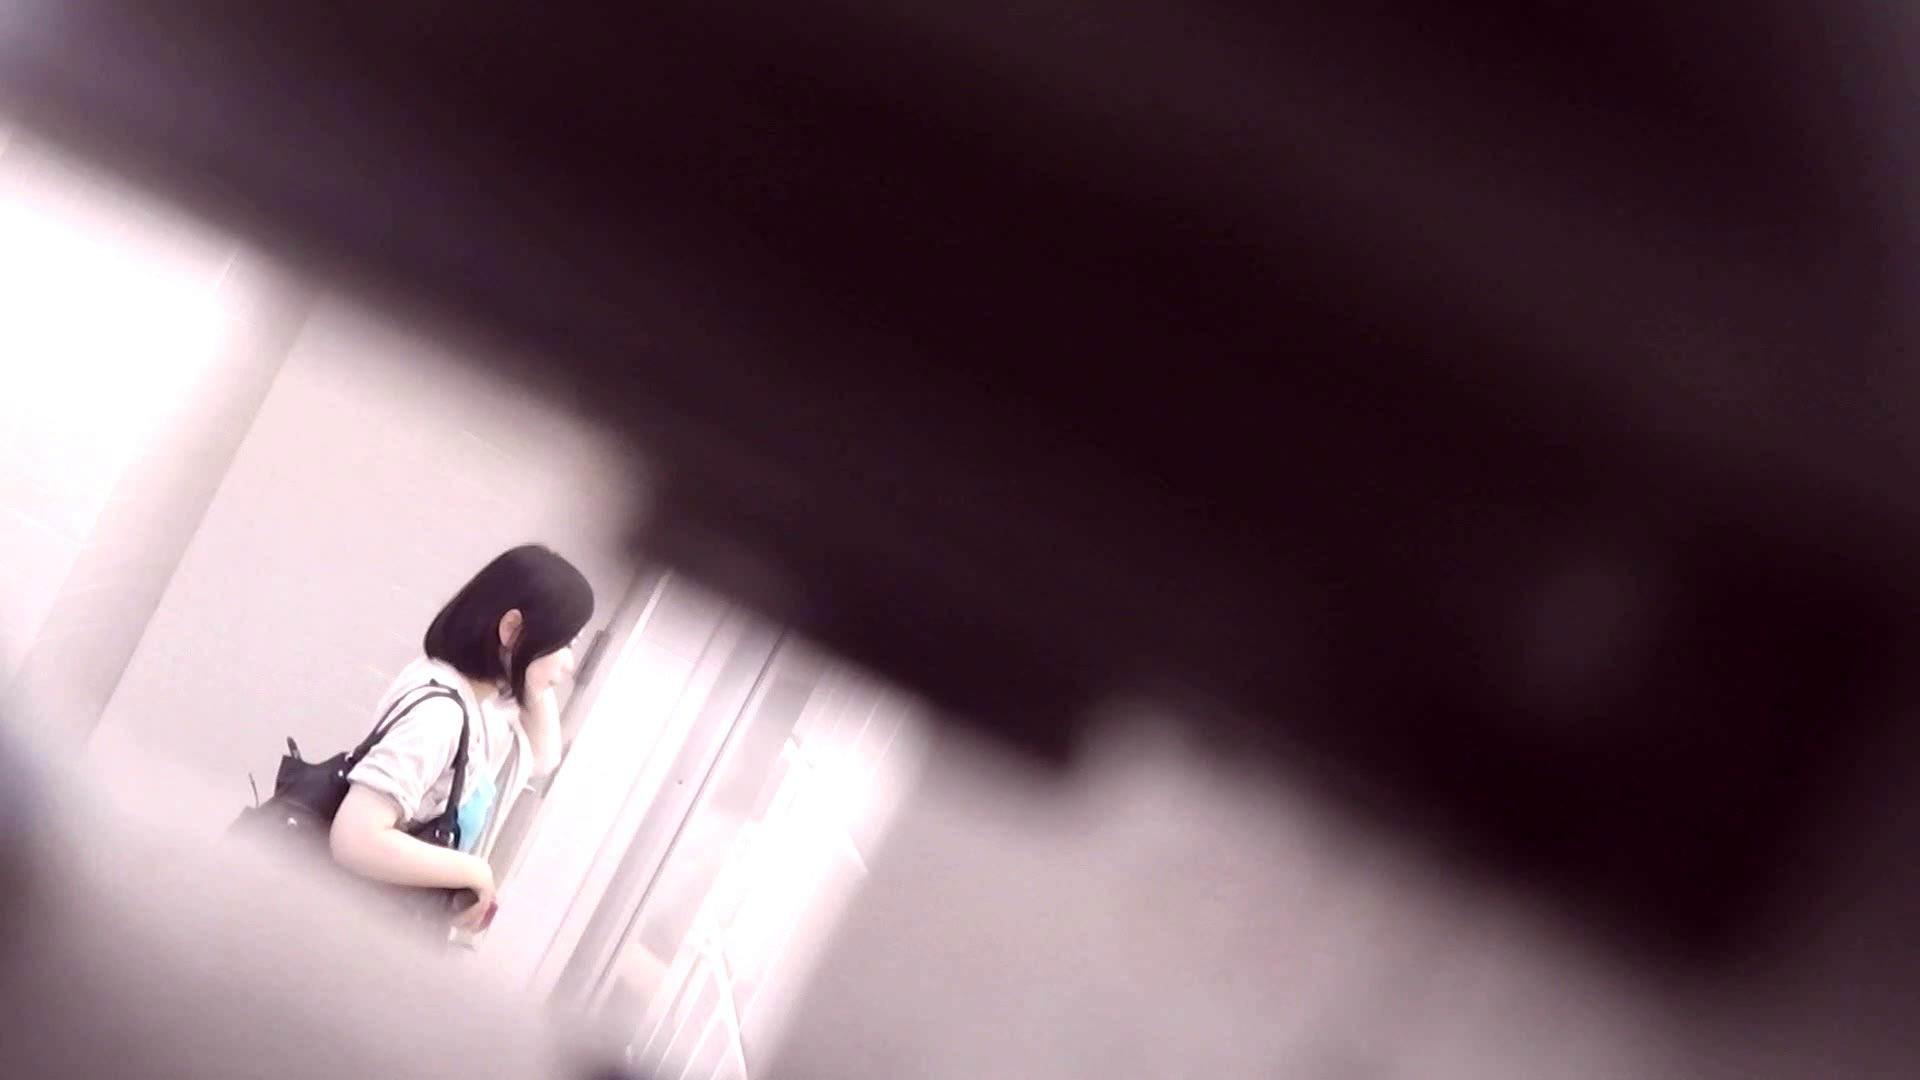 vol.16 命がけ潜伏洗面所! 美女たっぷり!! 潜入 えろ無修正画像 106画像 54